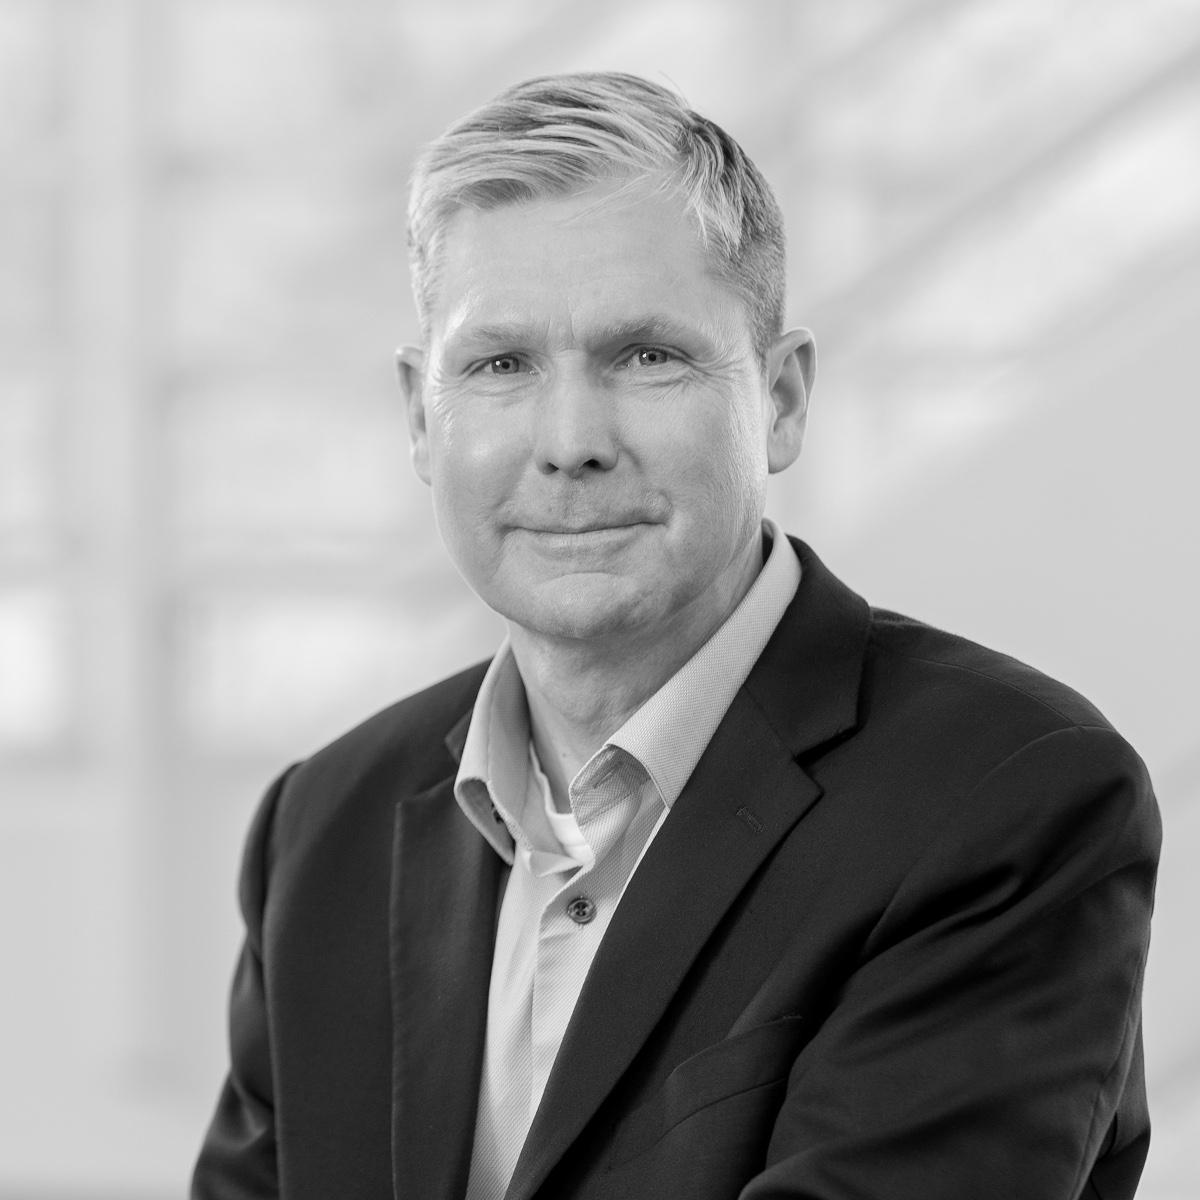 Paul Hansen, AIA, LEED AP